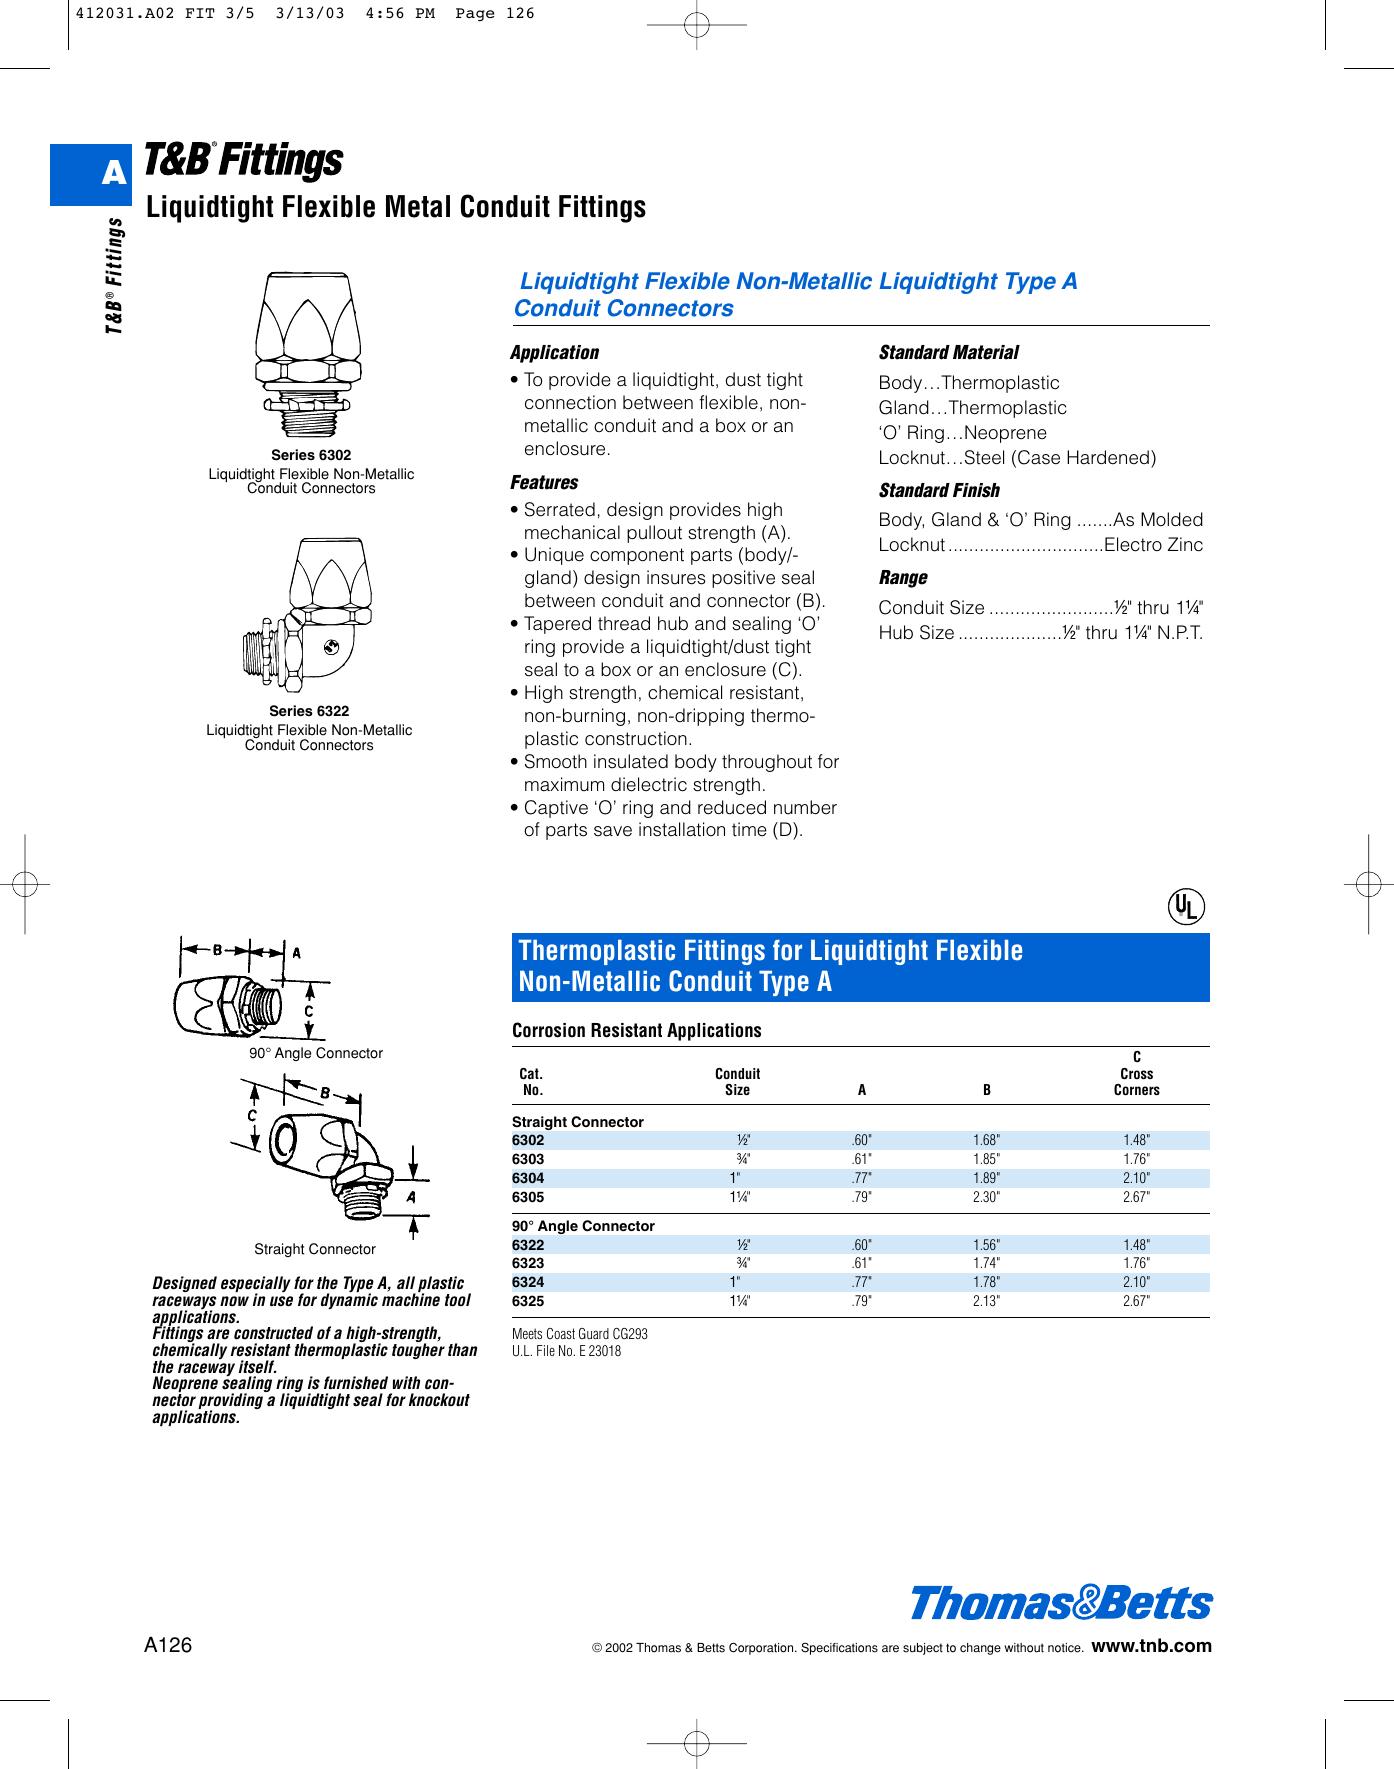 T&B Fittings Catalog 93457